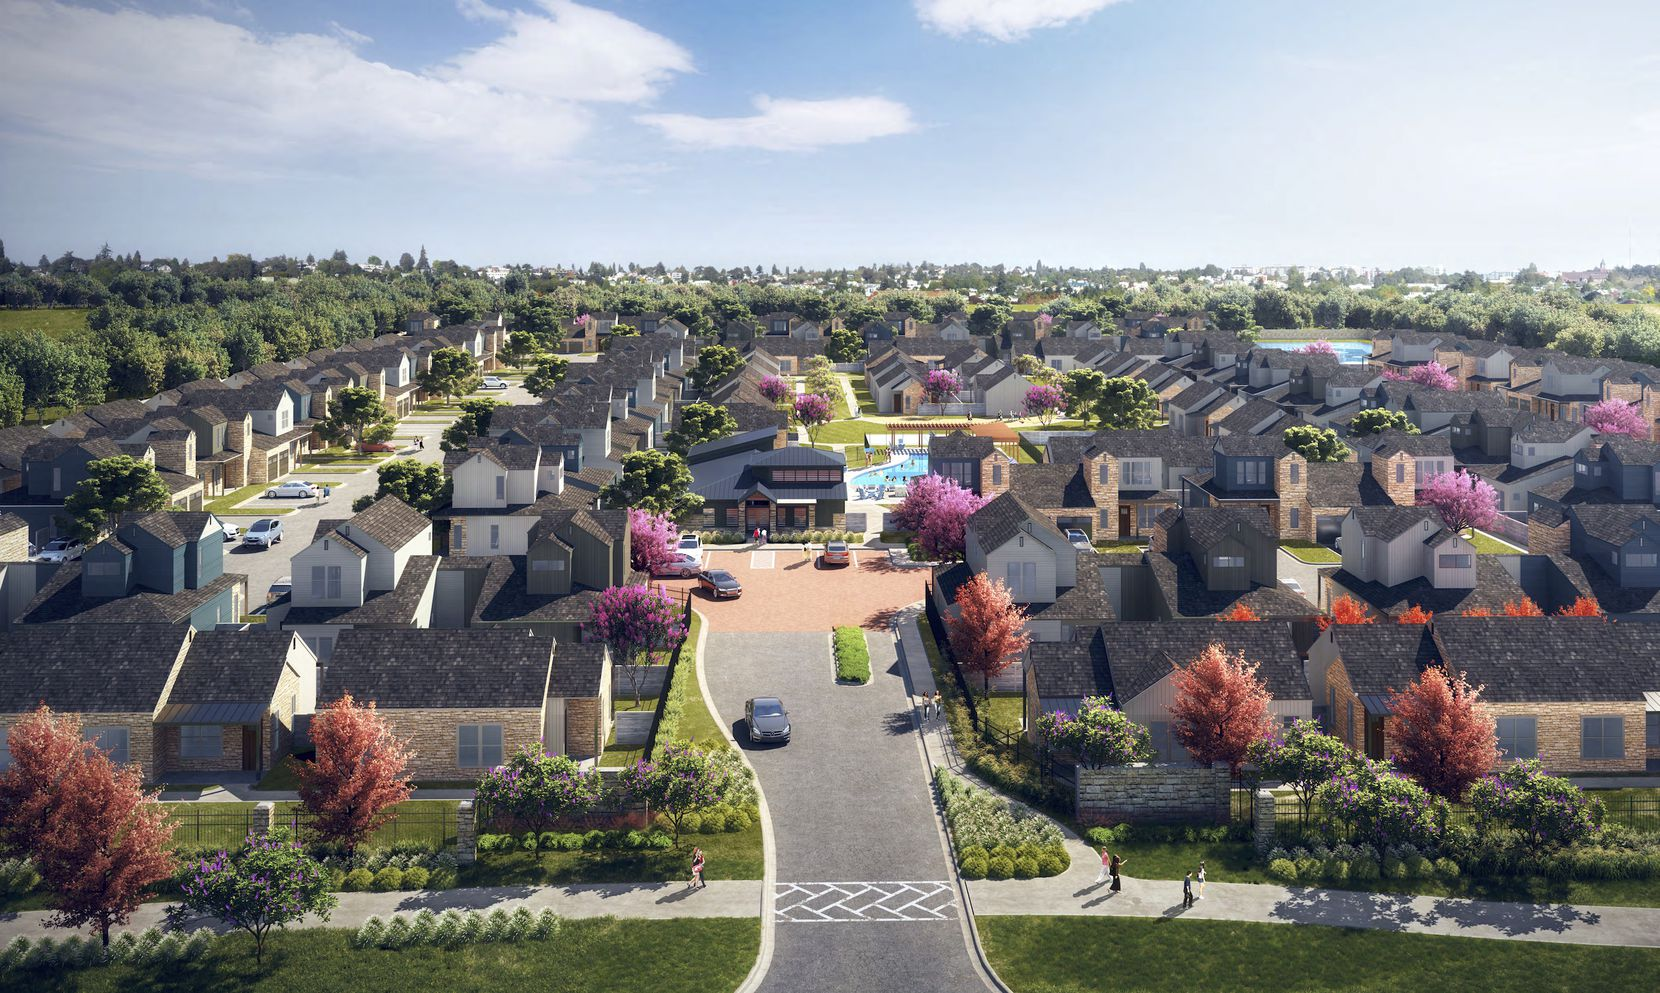 Developer Provident Realty Advisors' new Celina community will include 185 single-family home style rental units.